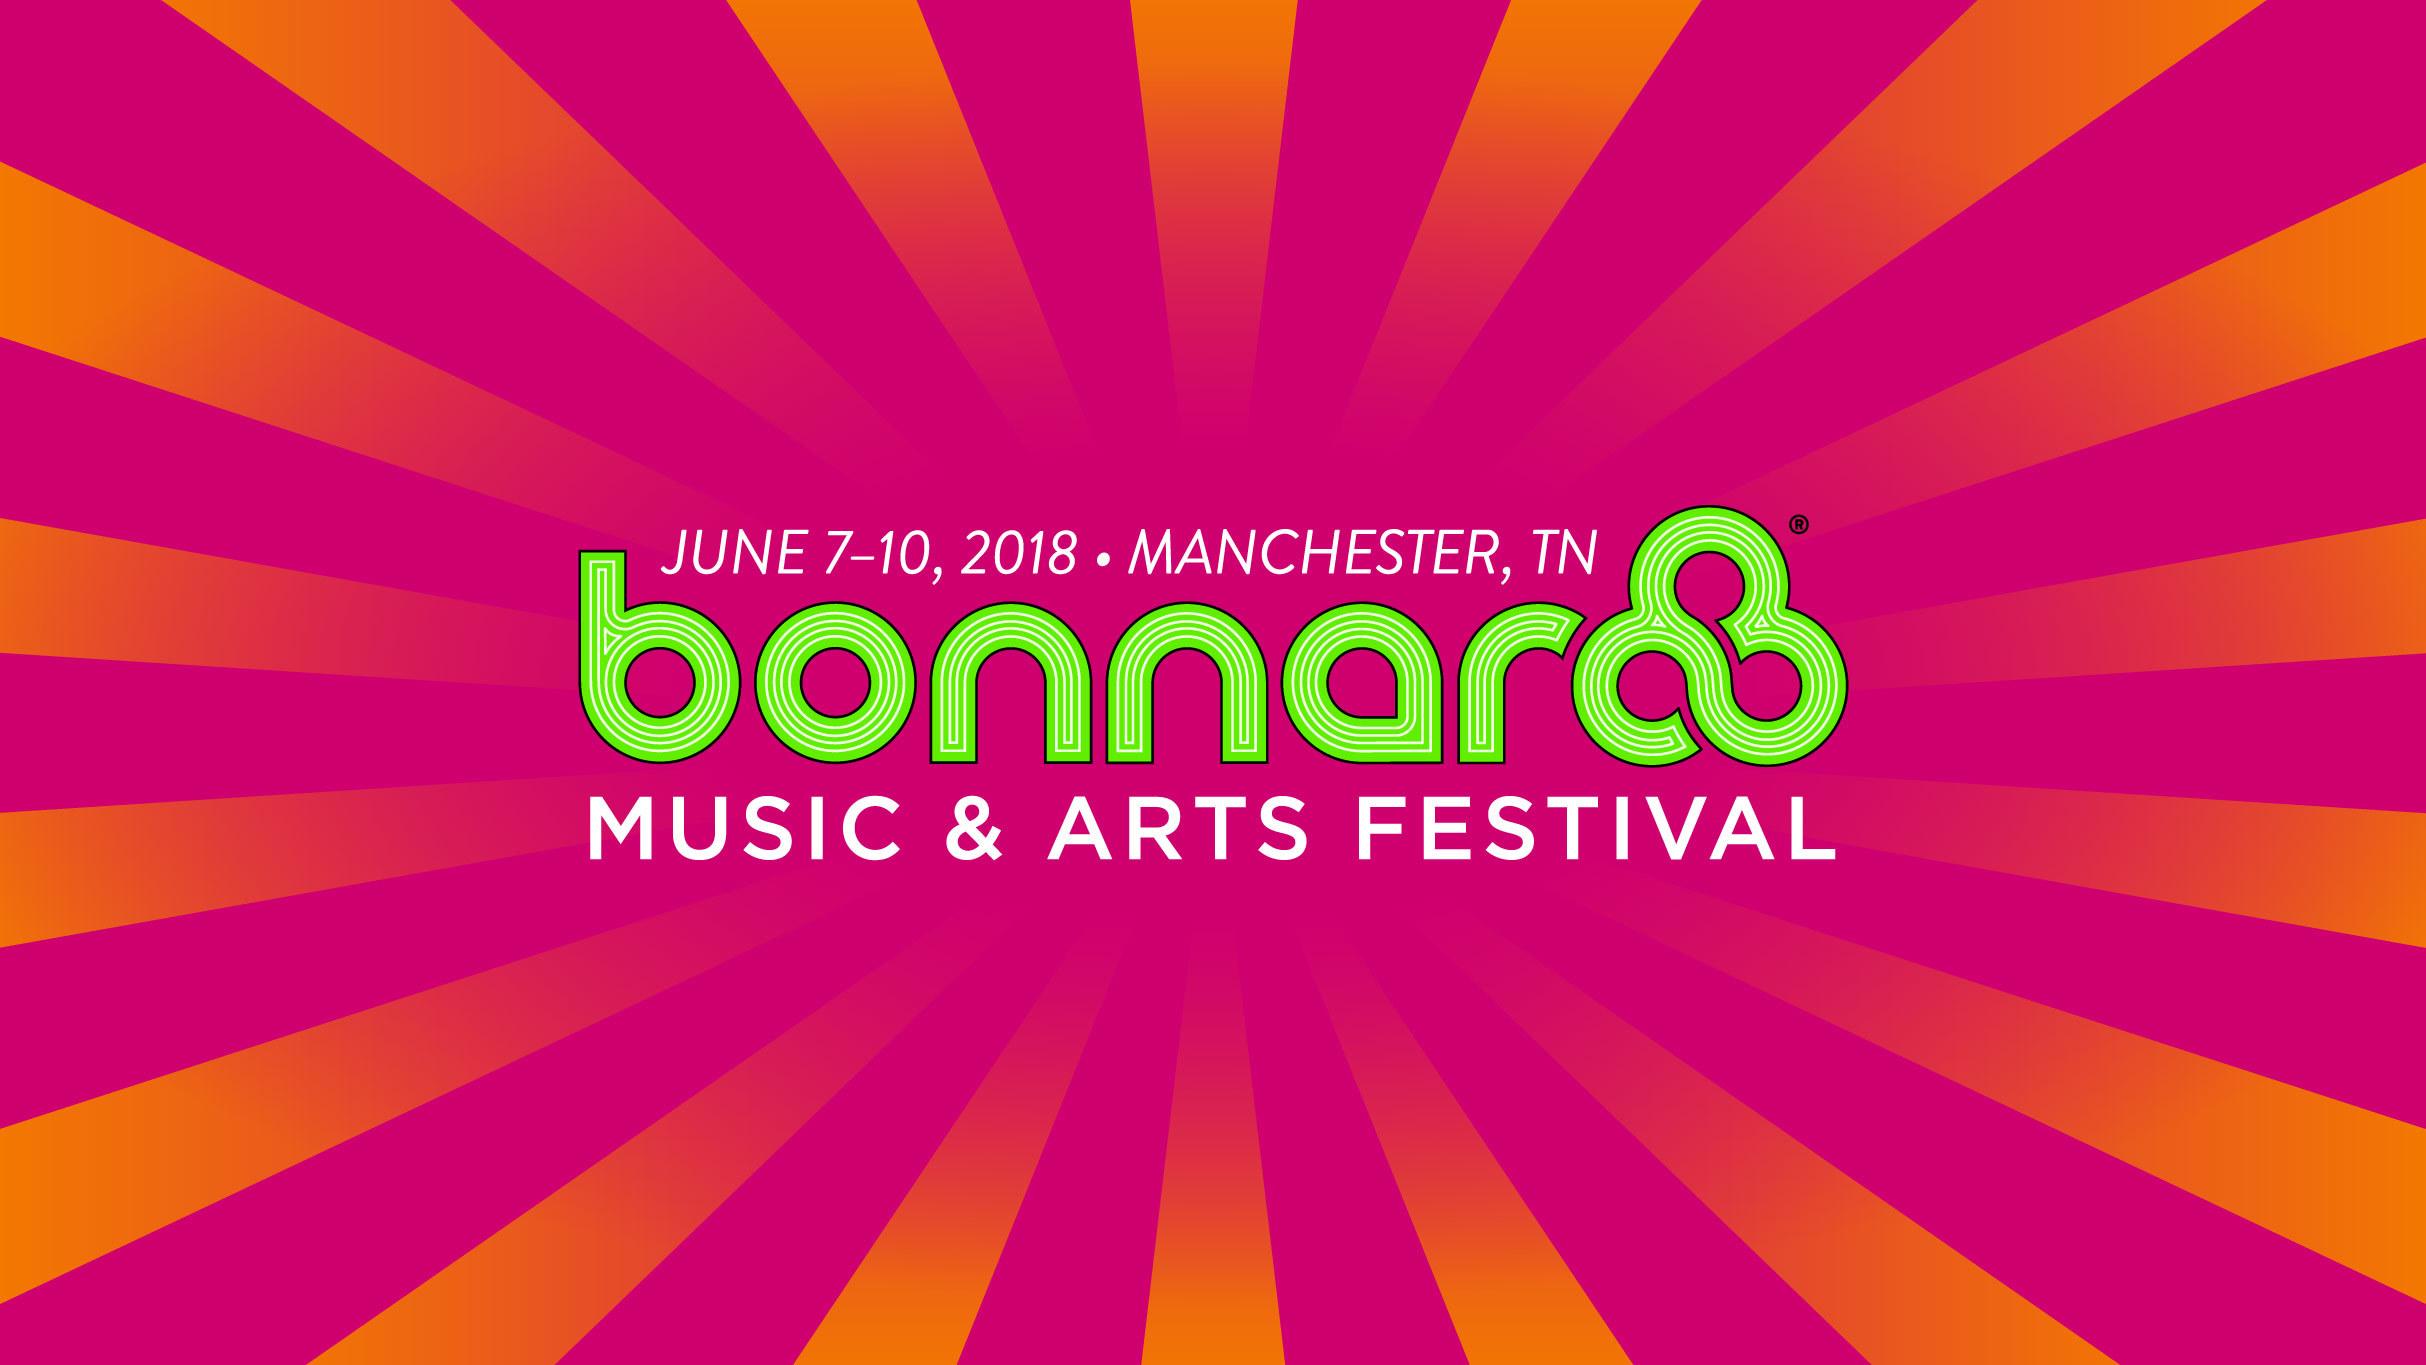 Charitybuzz 2 vip tickets to bonnaroo 2018 in manchester tn on original m4hsunfo Gallery